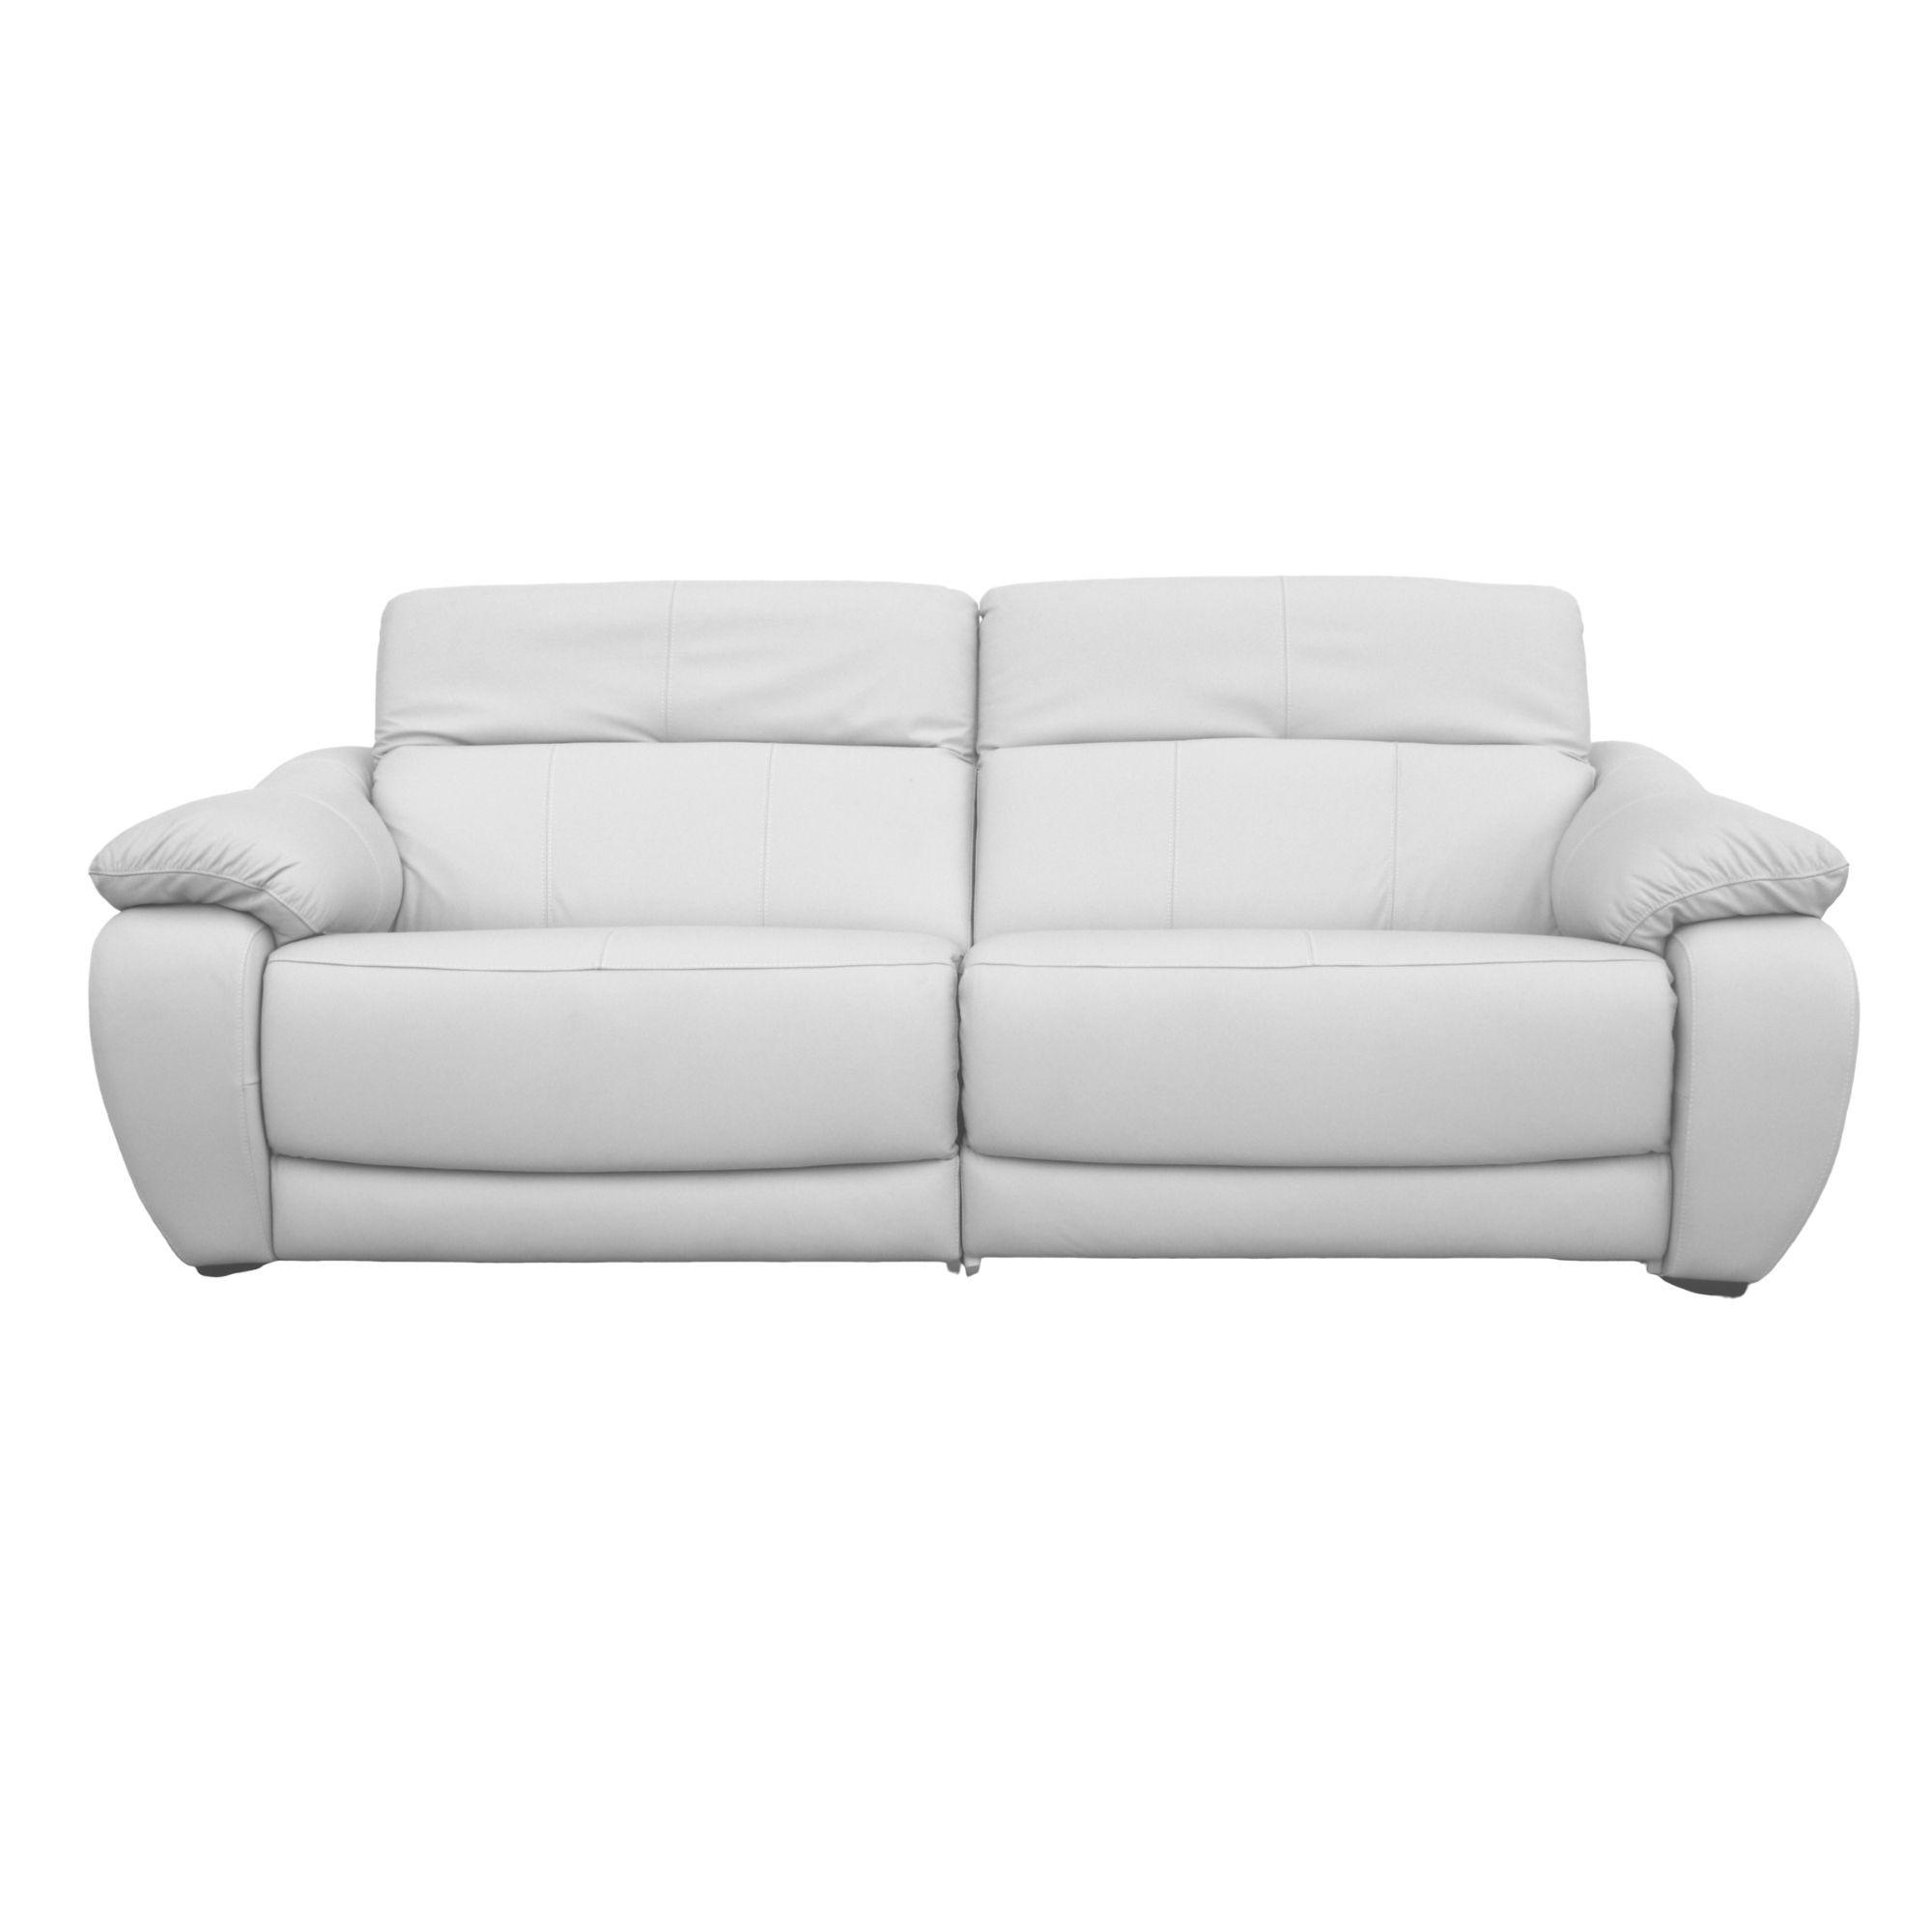 Image of: Sofa Retratil Eletrico De Couro 2 Lugares 176cm Royal Branco Formato Moveis